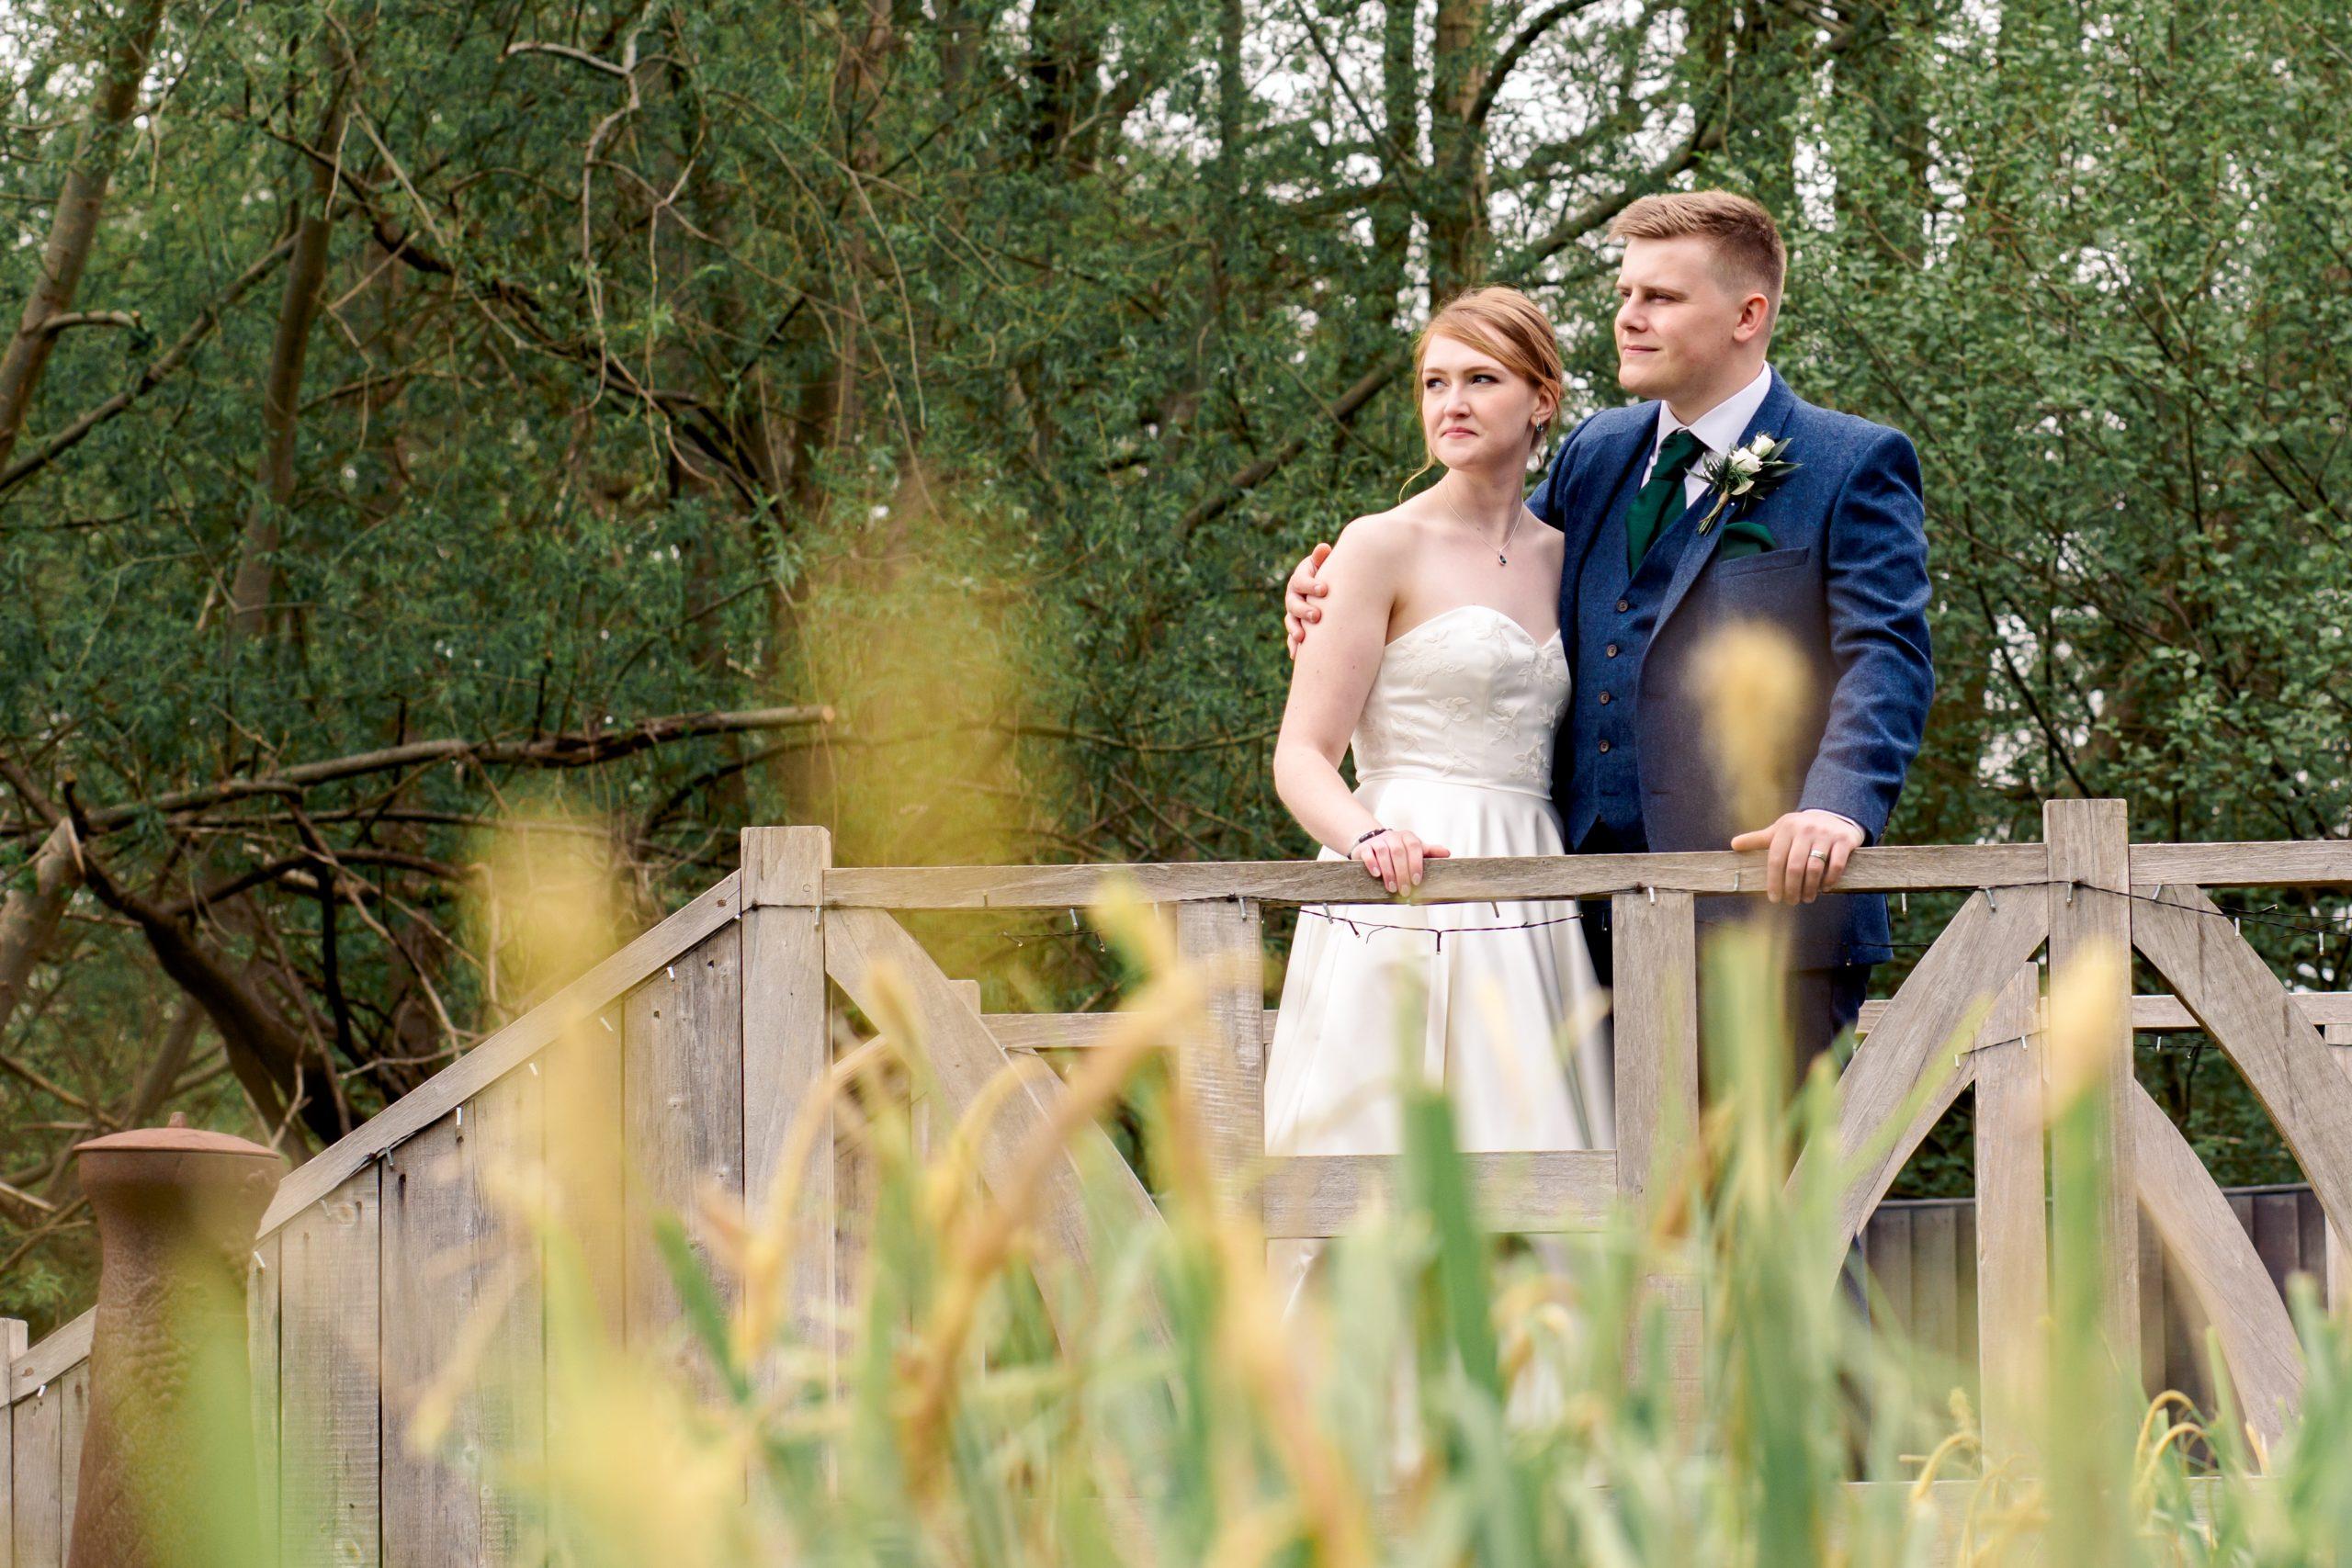 Morgan and Kyle Wedding Bradgate Park Perfect Ceremonies May 2021